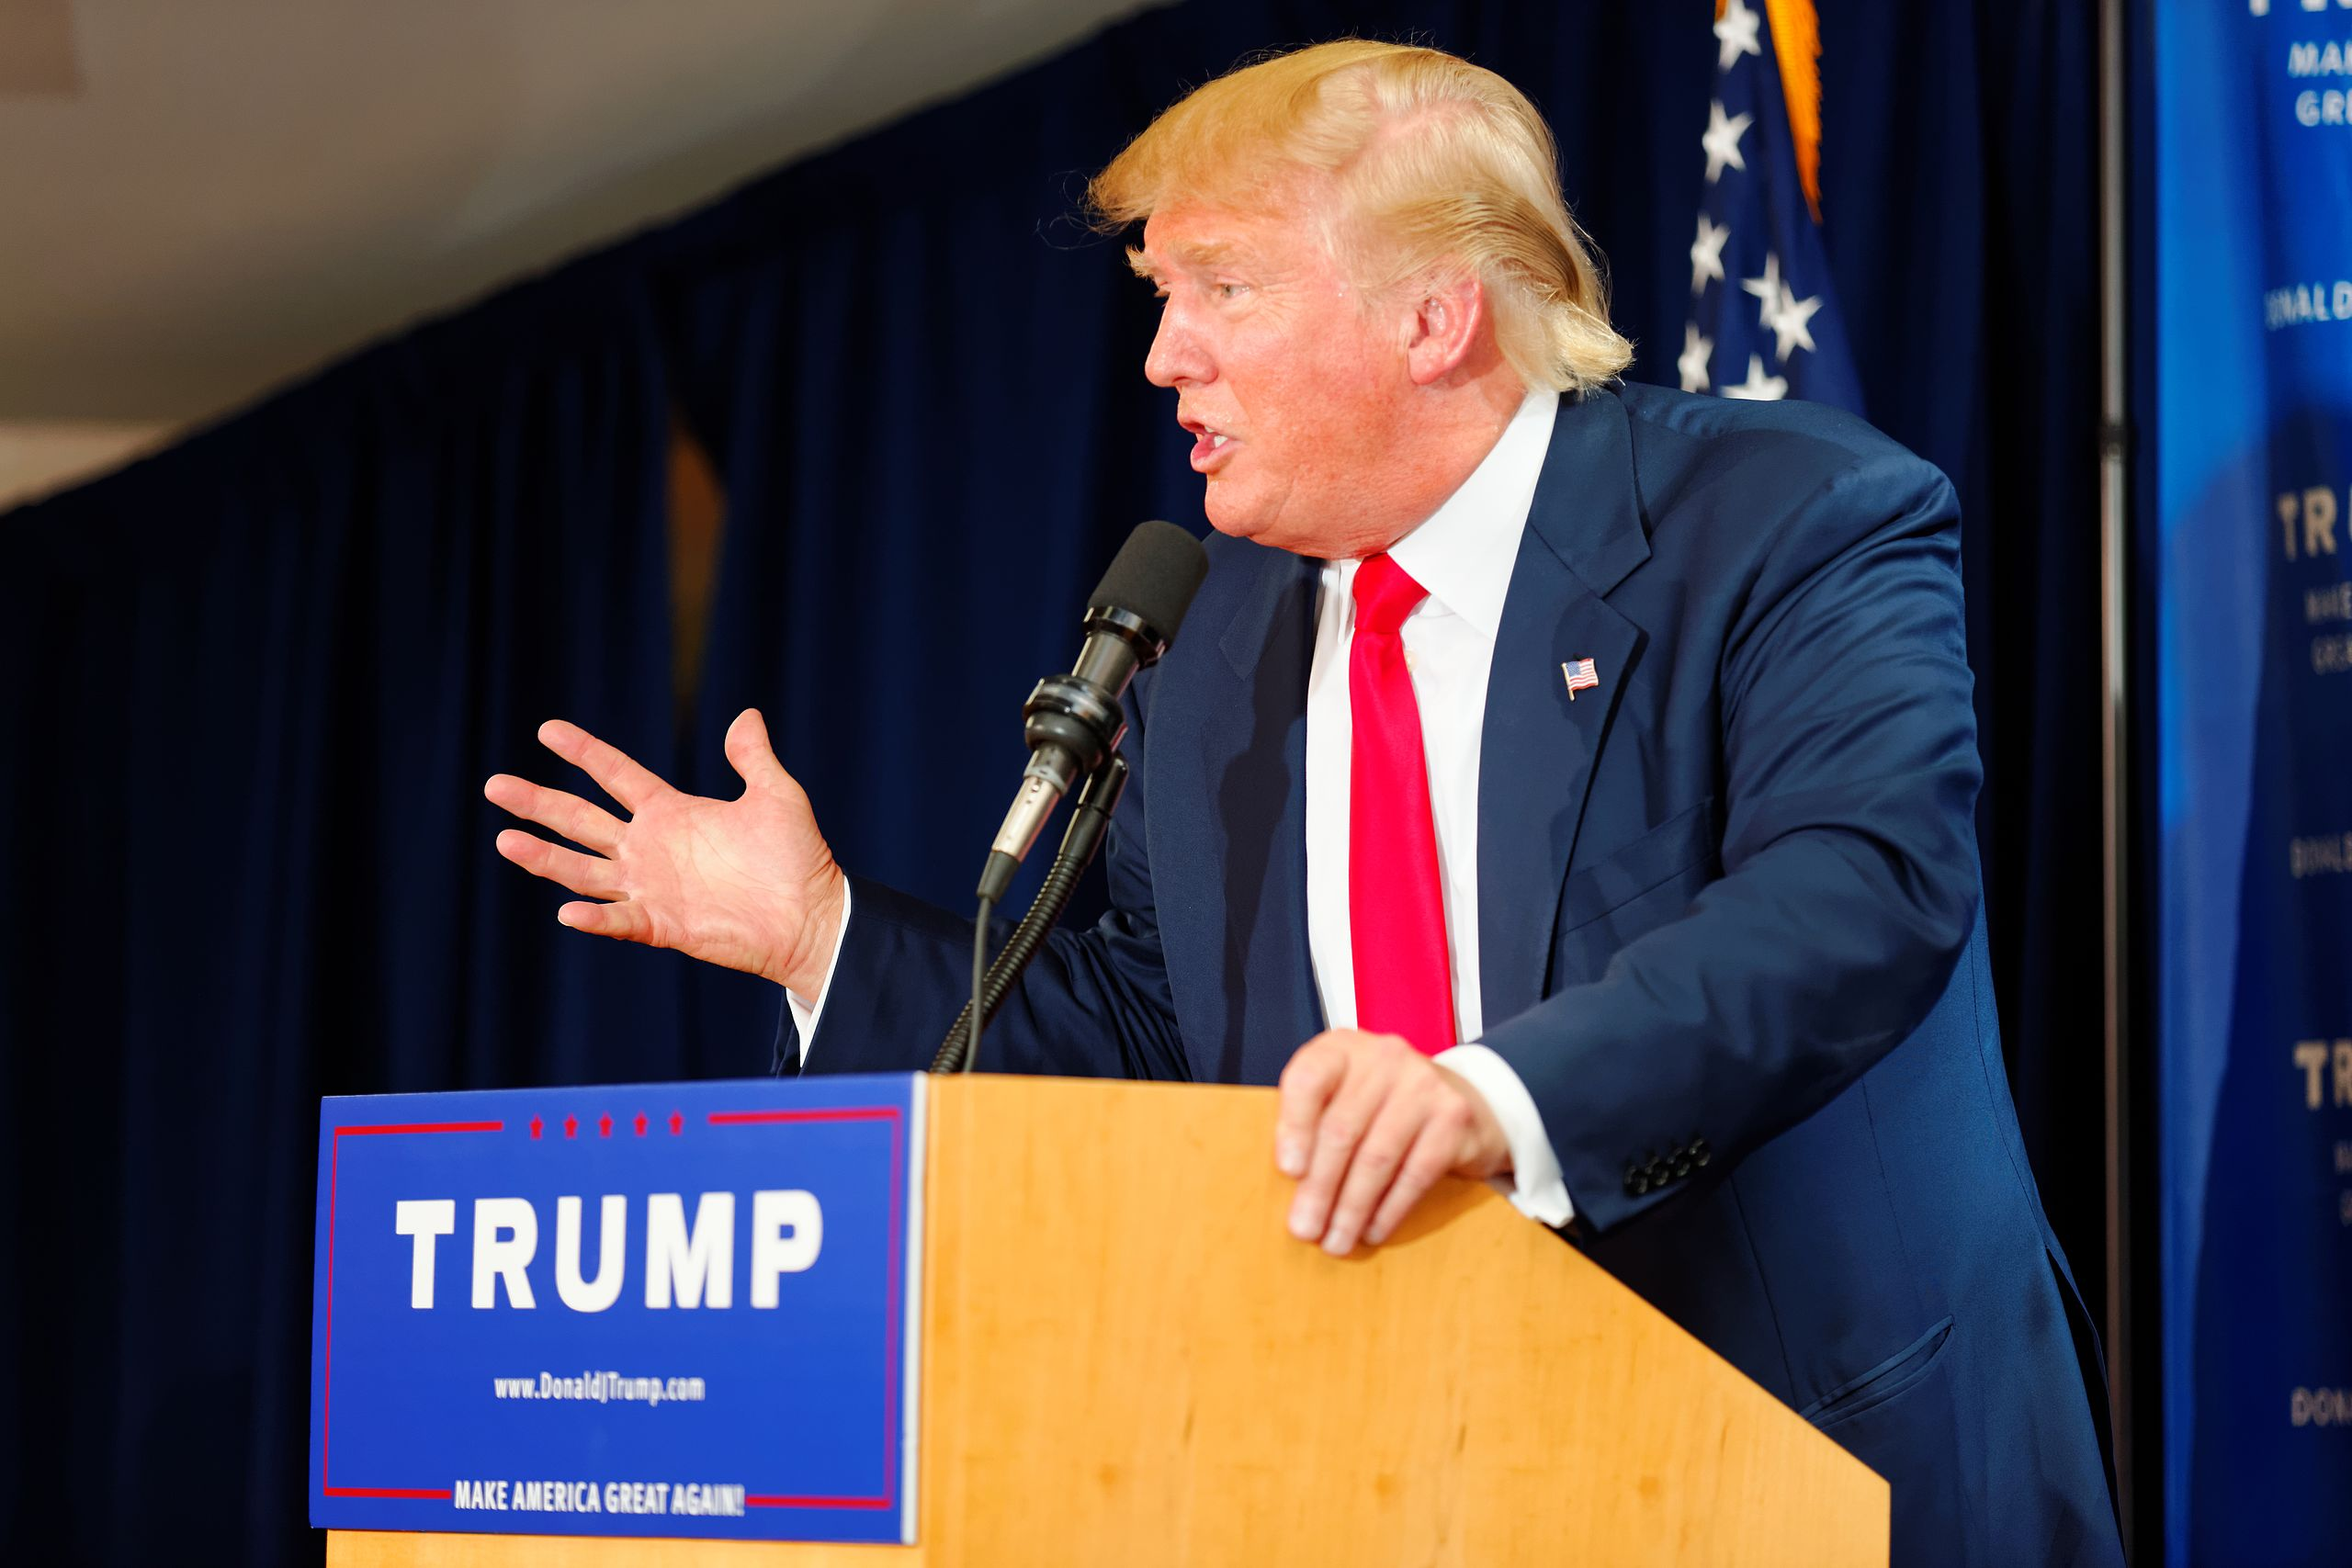 Donald_Trump_Laconia_Rally__Laconia__NH_4_by_Michael_Vadon_July_16_2015_19.jpg